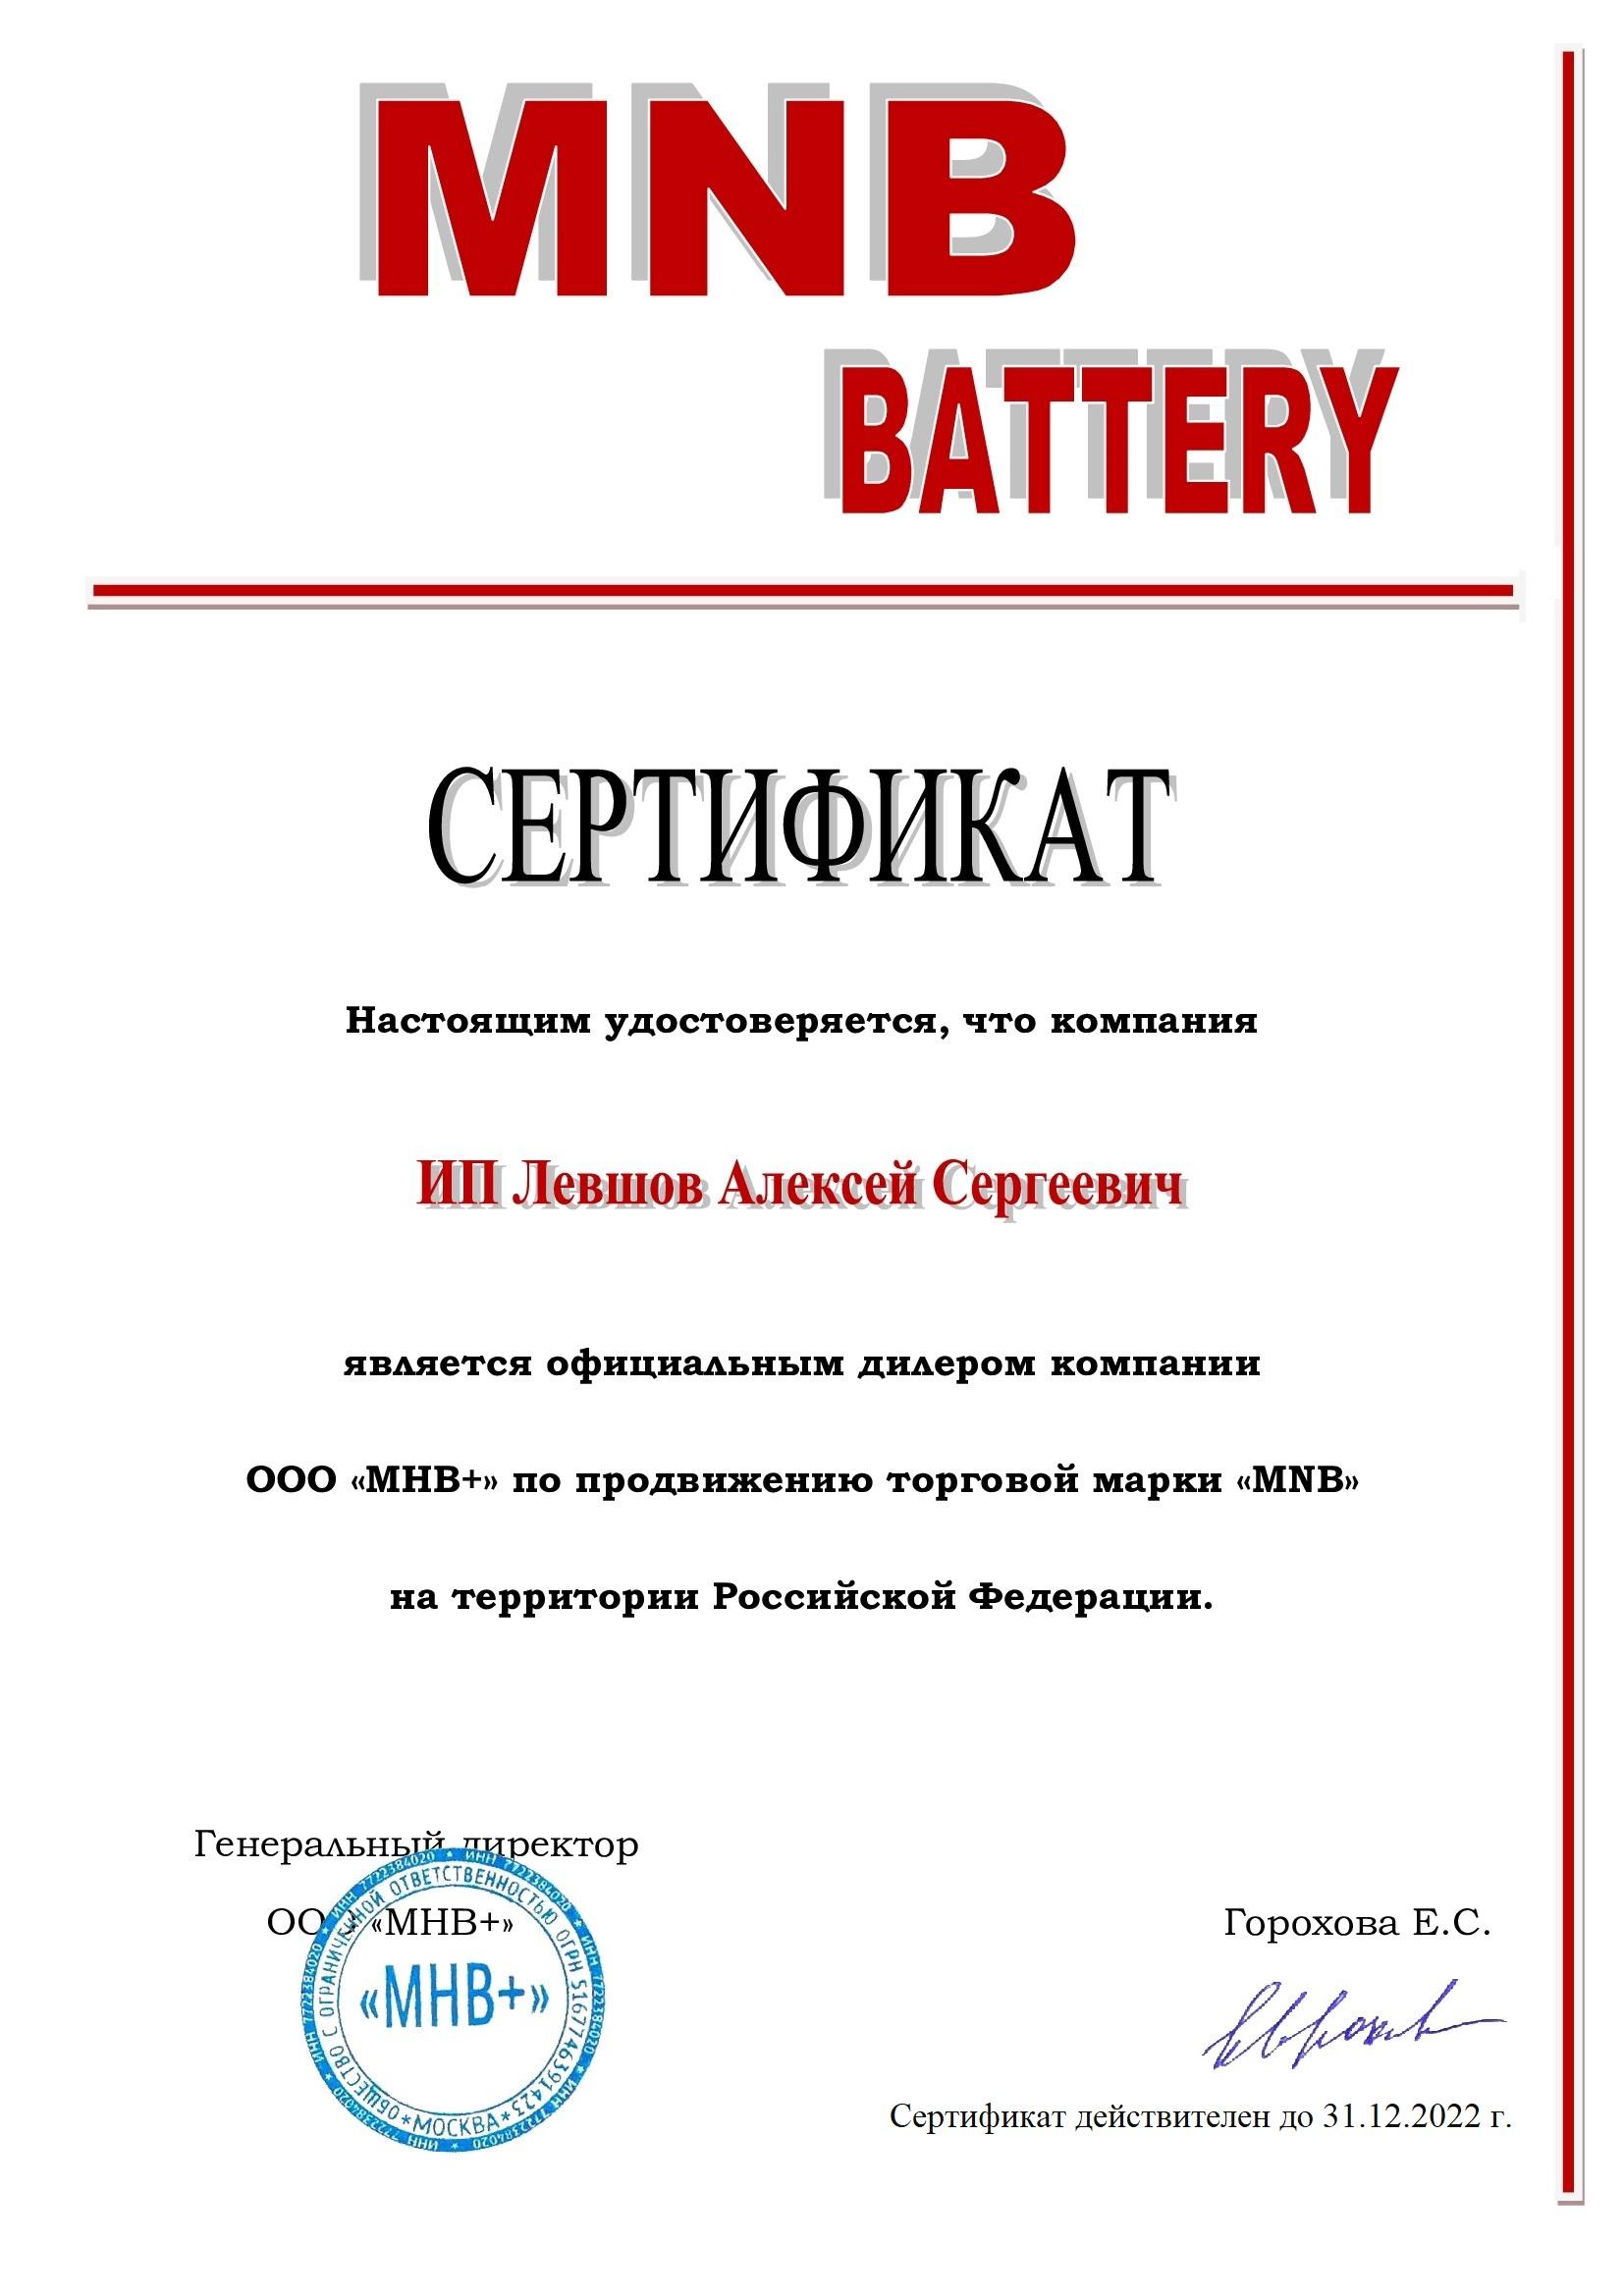 Sert_MNB_IP_Levshov.jpg